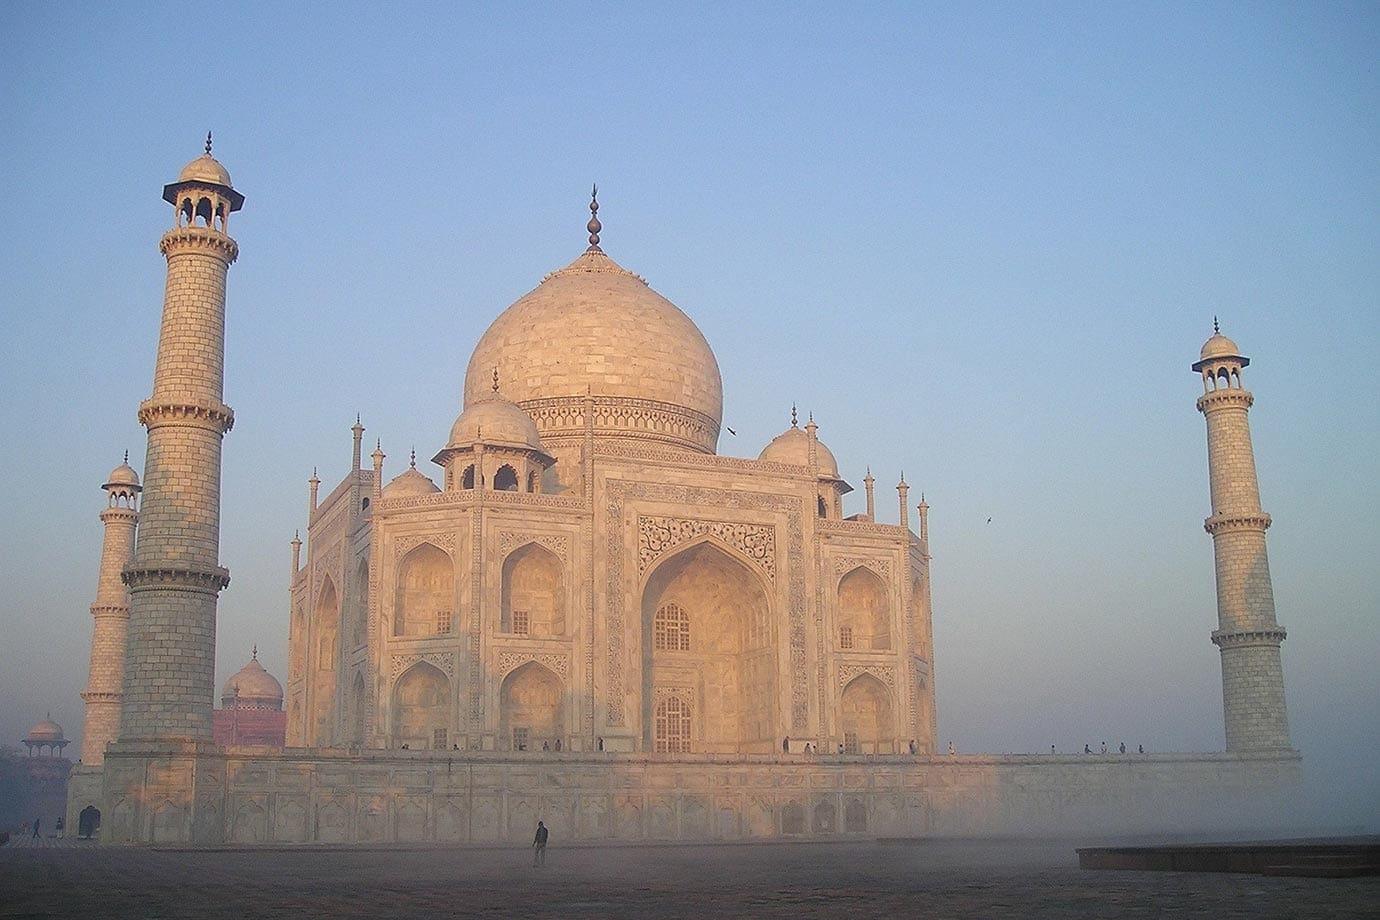 The Shocking Price of Tourism Around the World